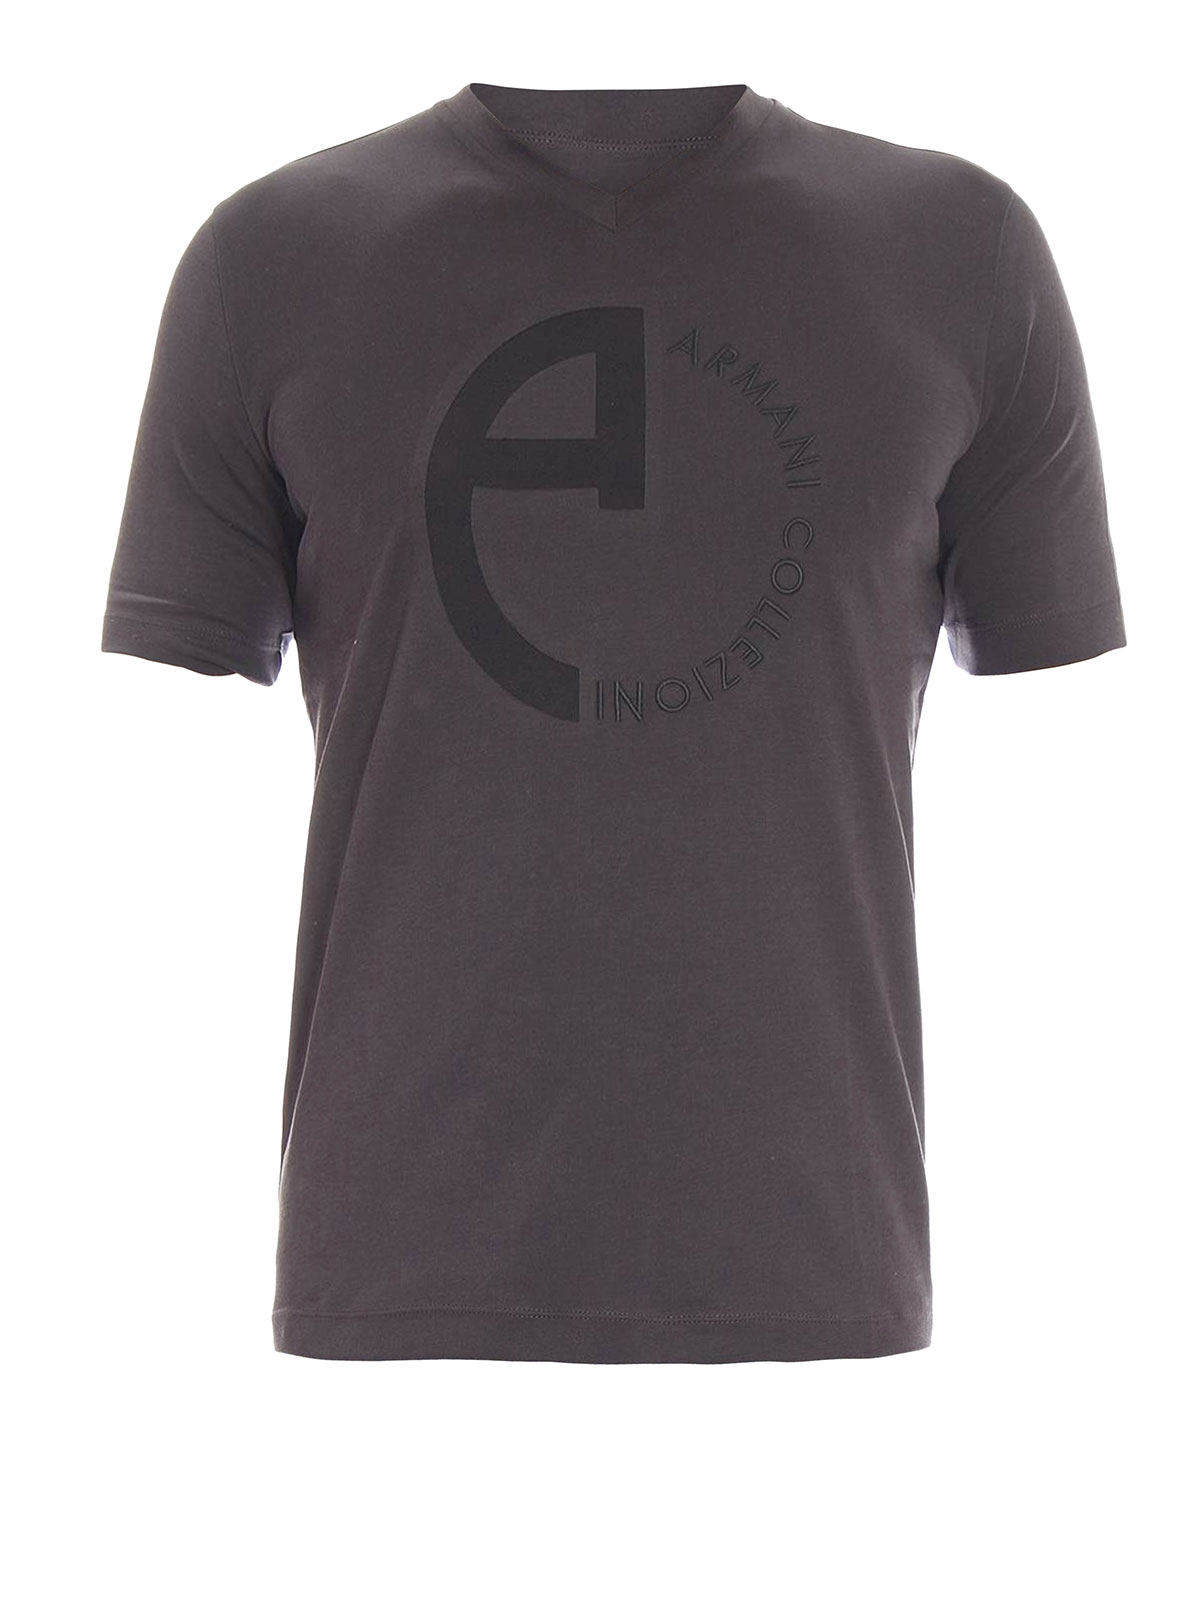 Embroidered logo t shirt by armani collezioni t shirts for Shirt with logo embroidered